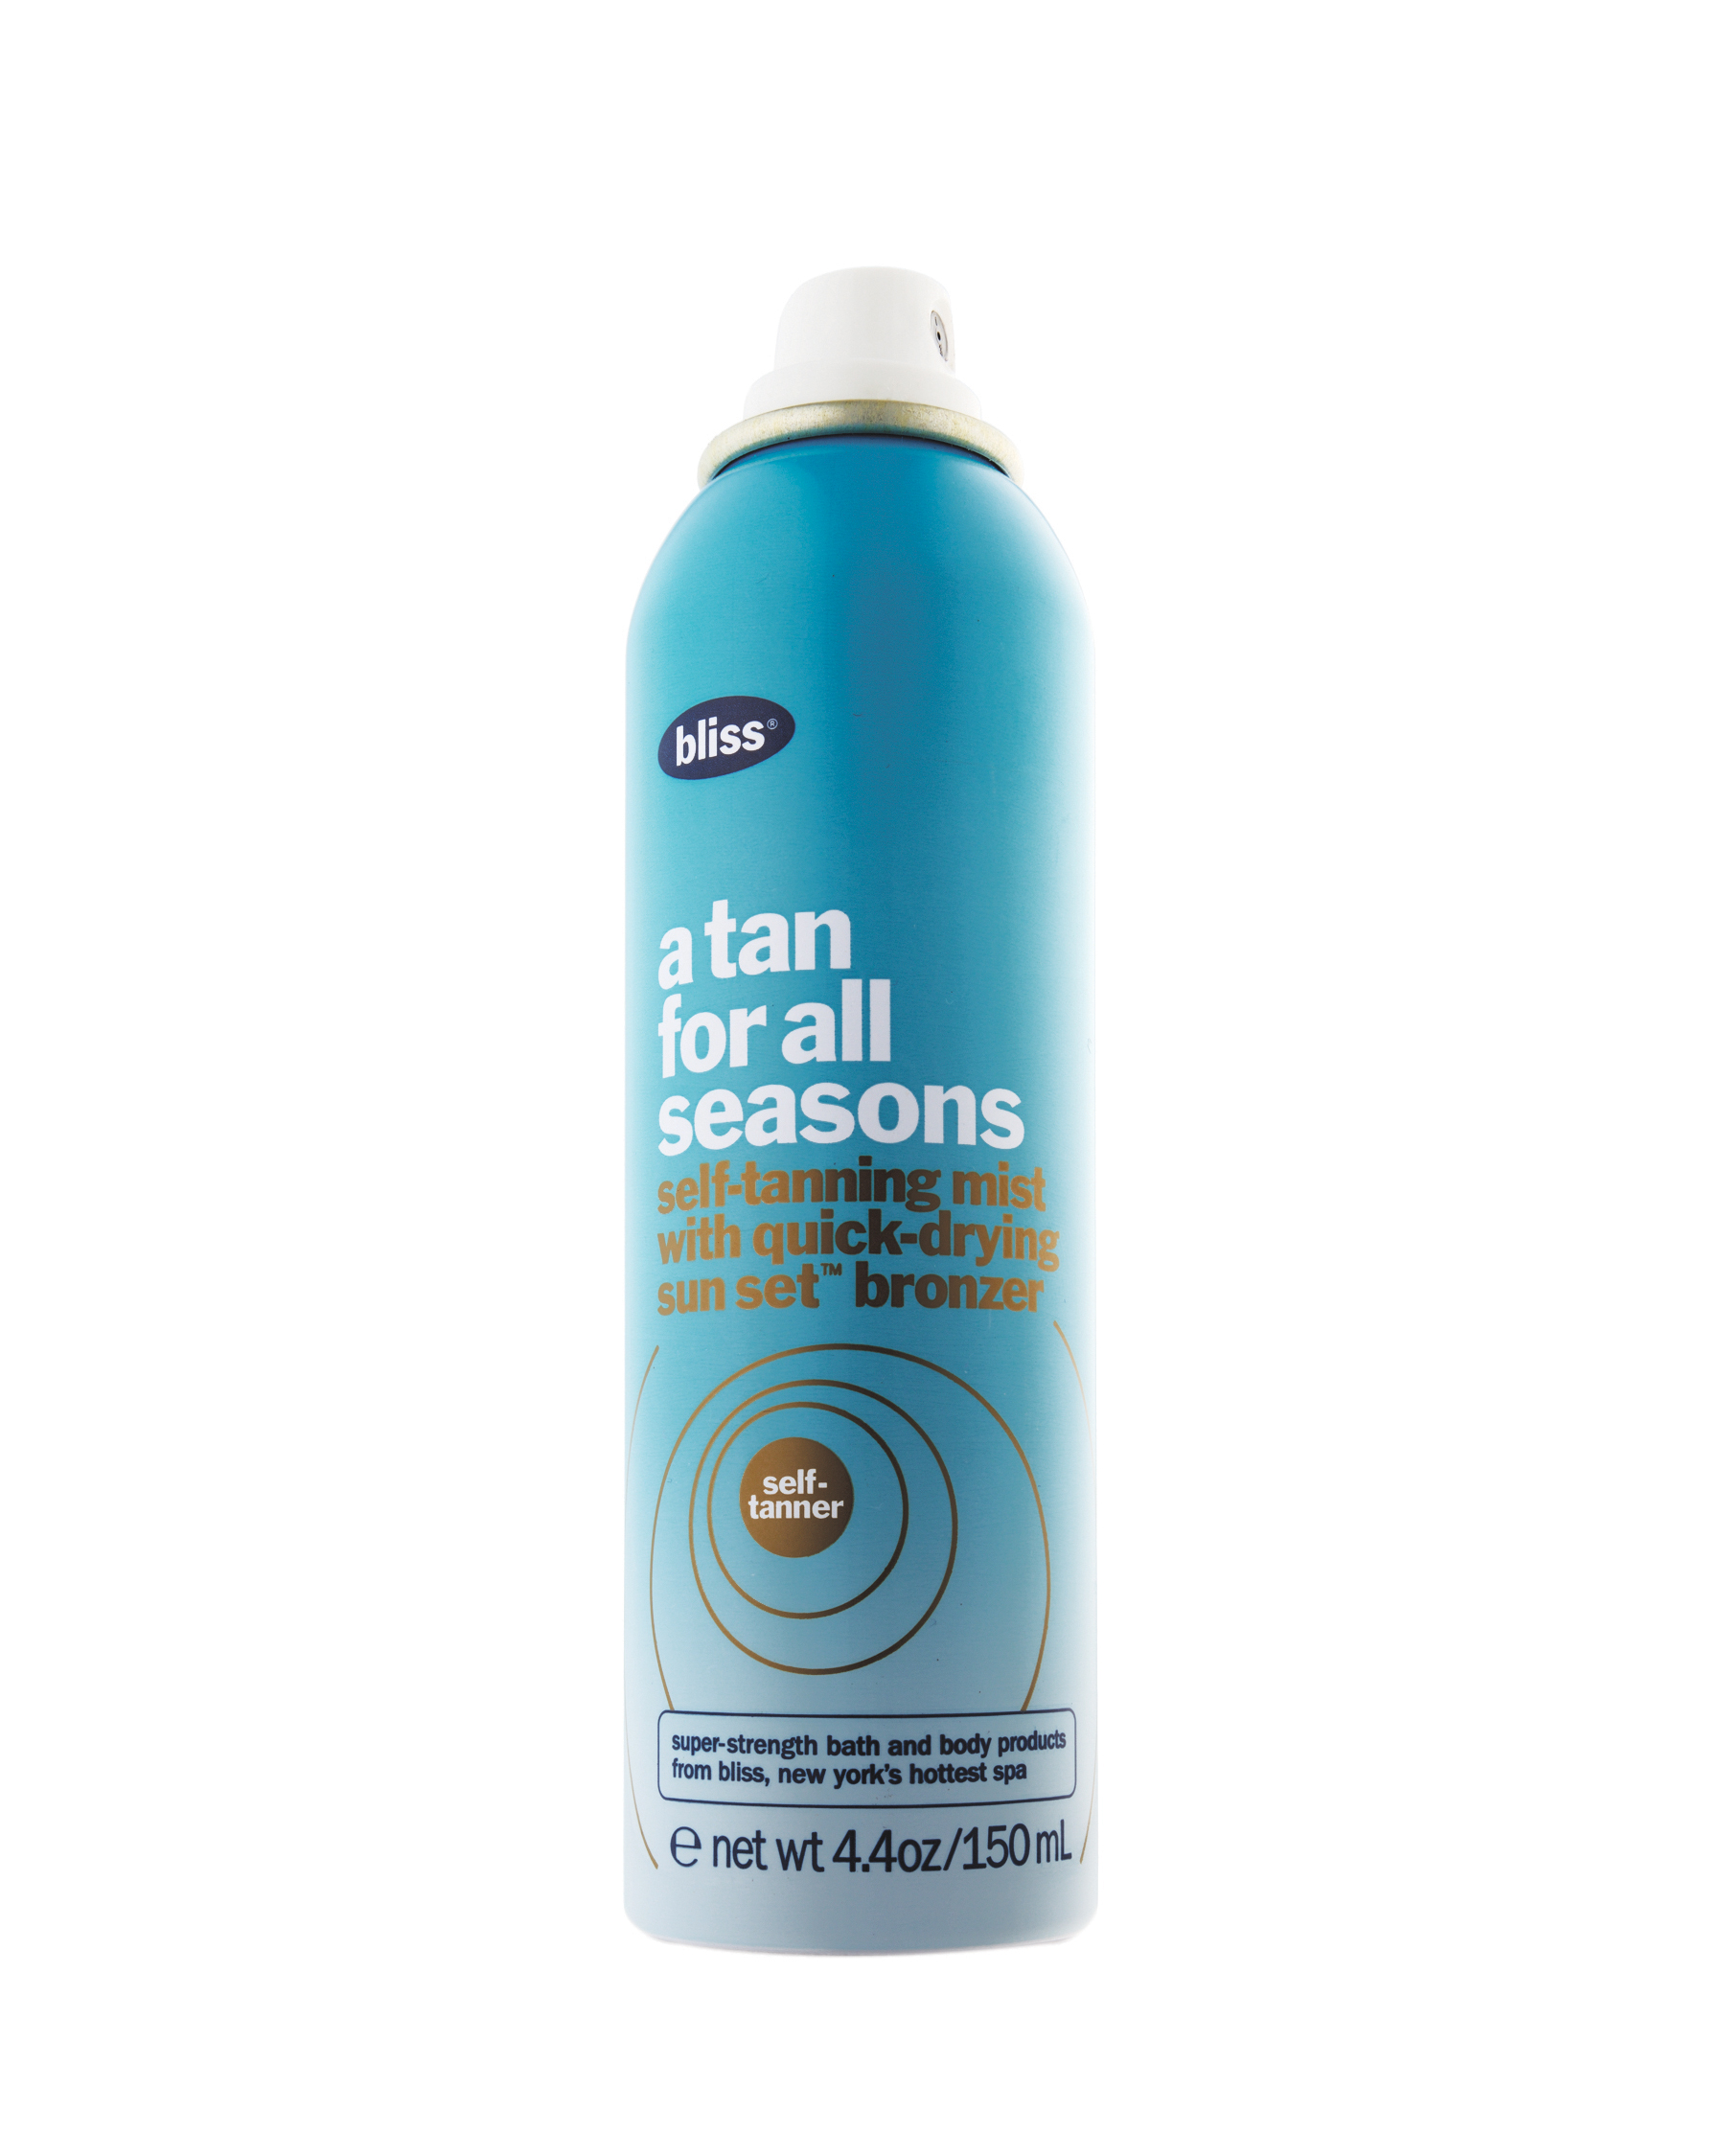 bliss-a-tan-for-all-seasons-0314.jpg